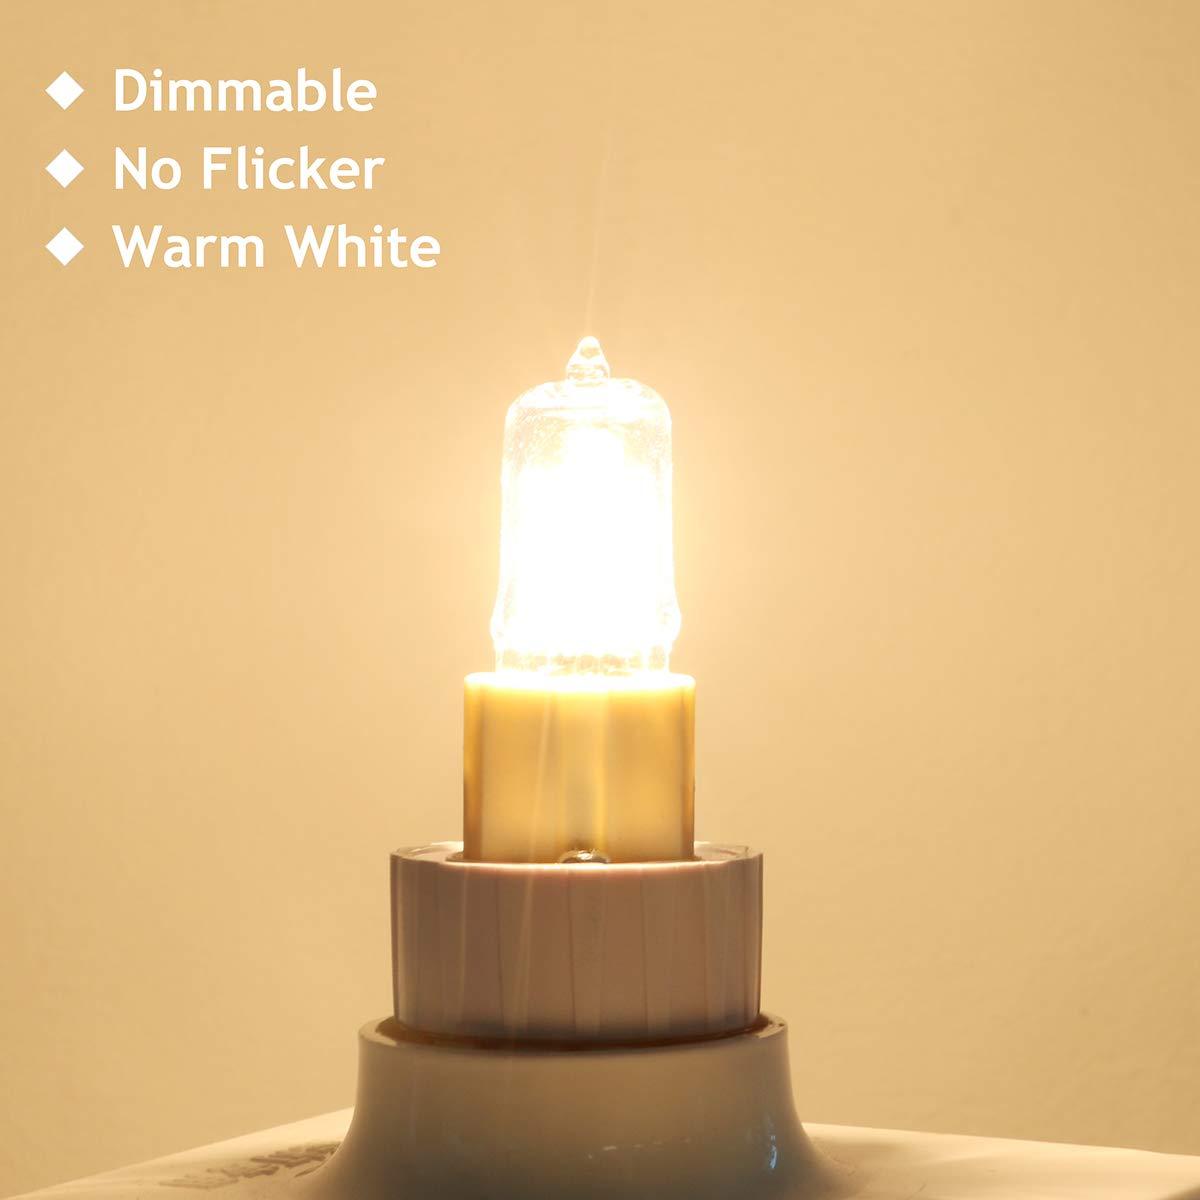 GMY Lighting Ampoules Halog/ènes G9 28W 230V 370Lm 2800K Dimmable Blanc Chaud Paquet de 10